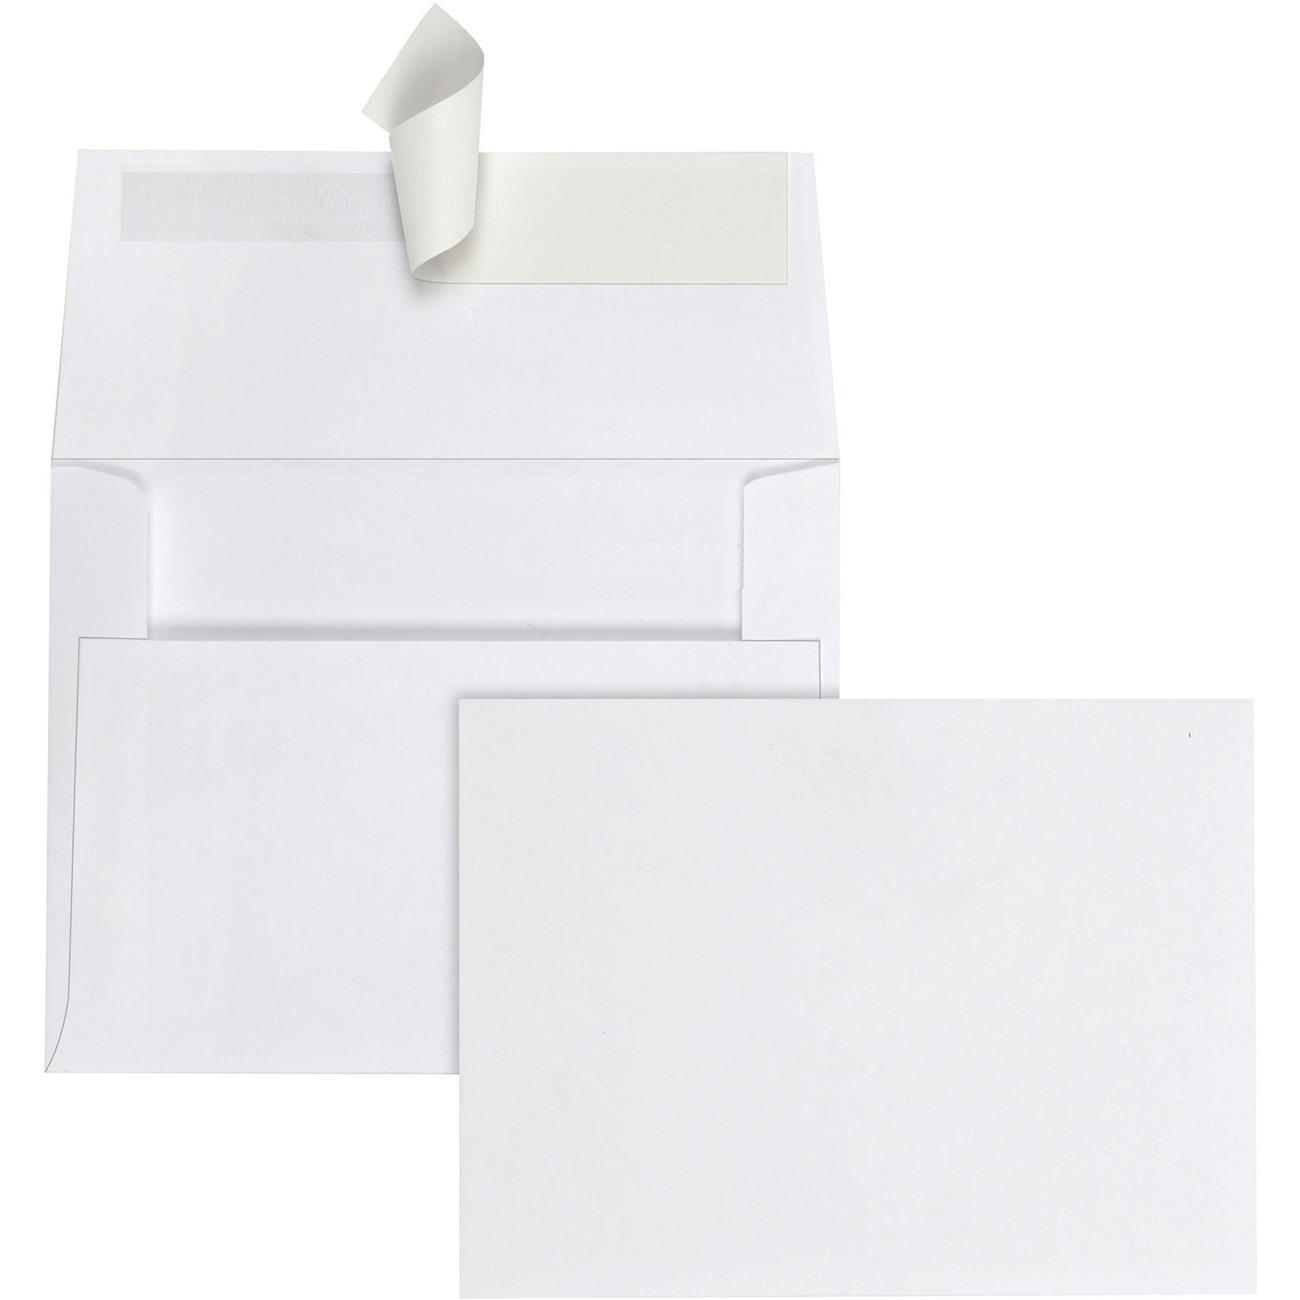 challenge industries ltd office supplies paper pads